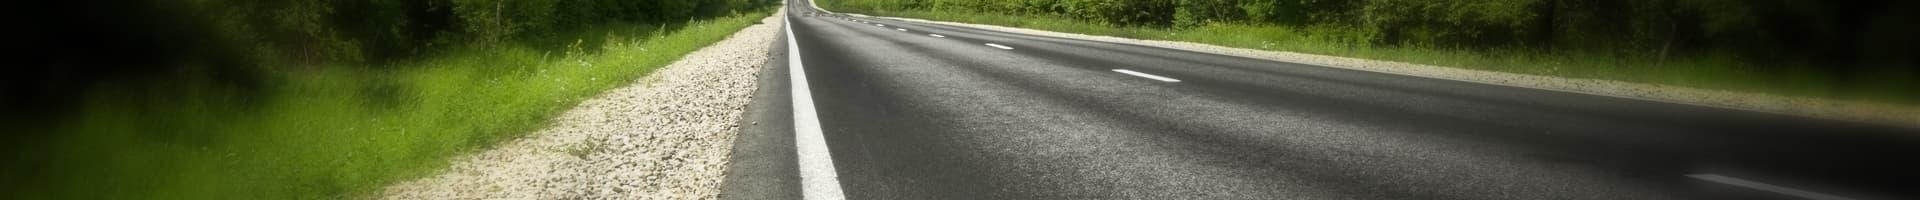 Slideground_Secondary_Highway